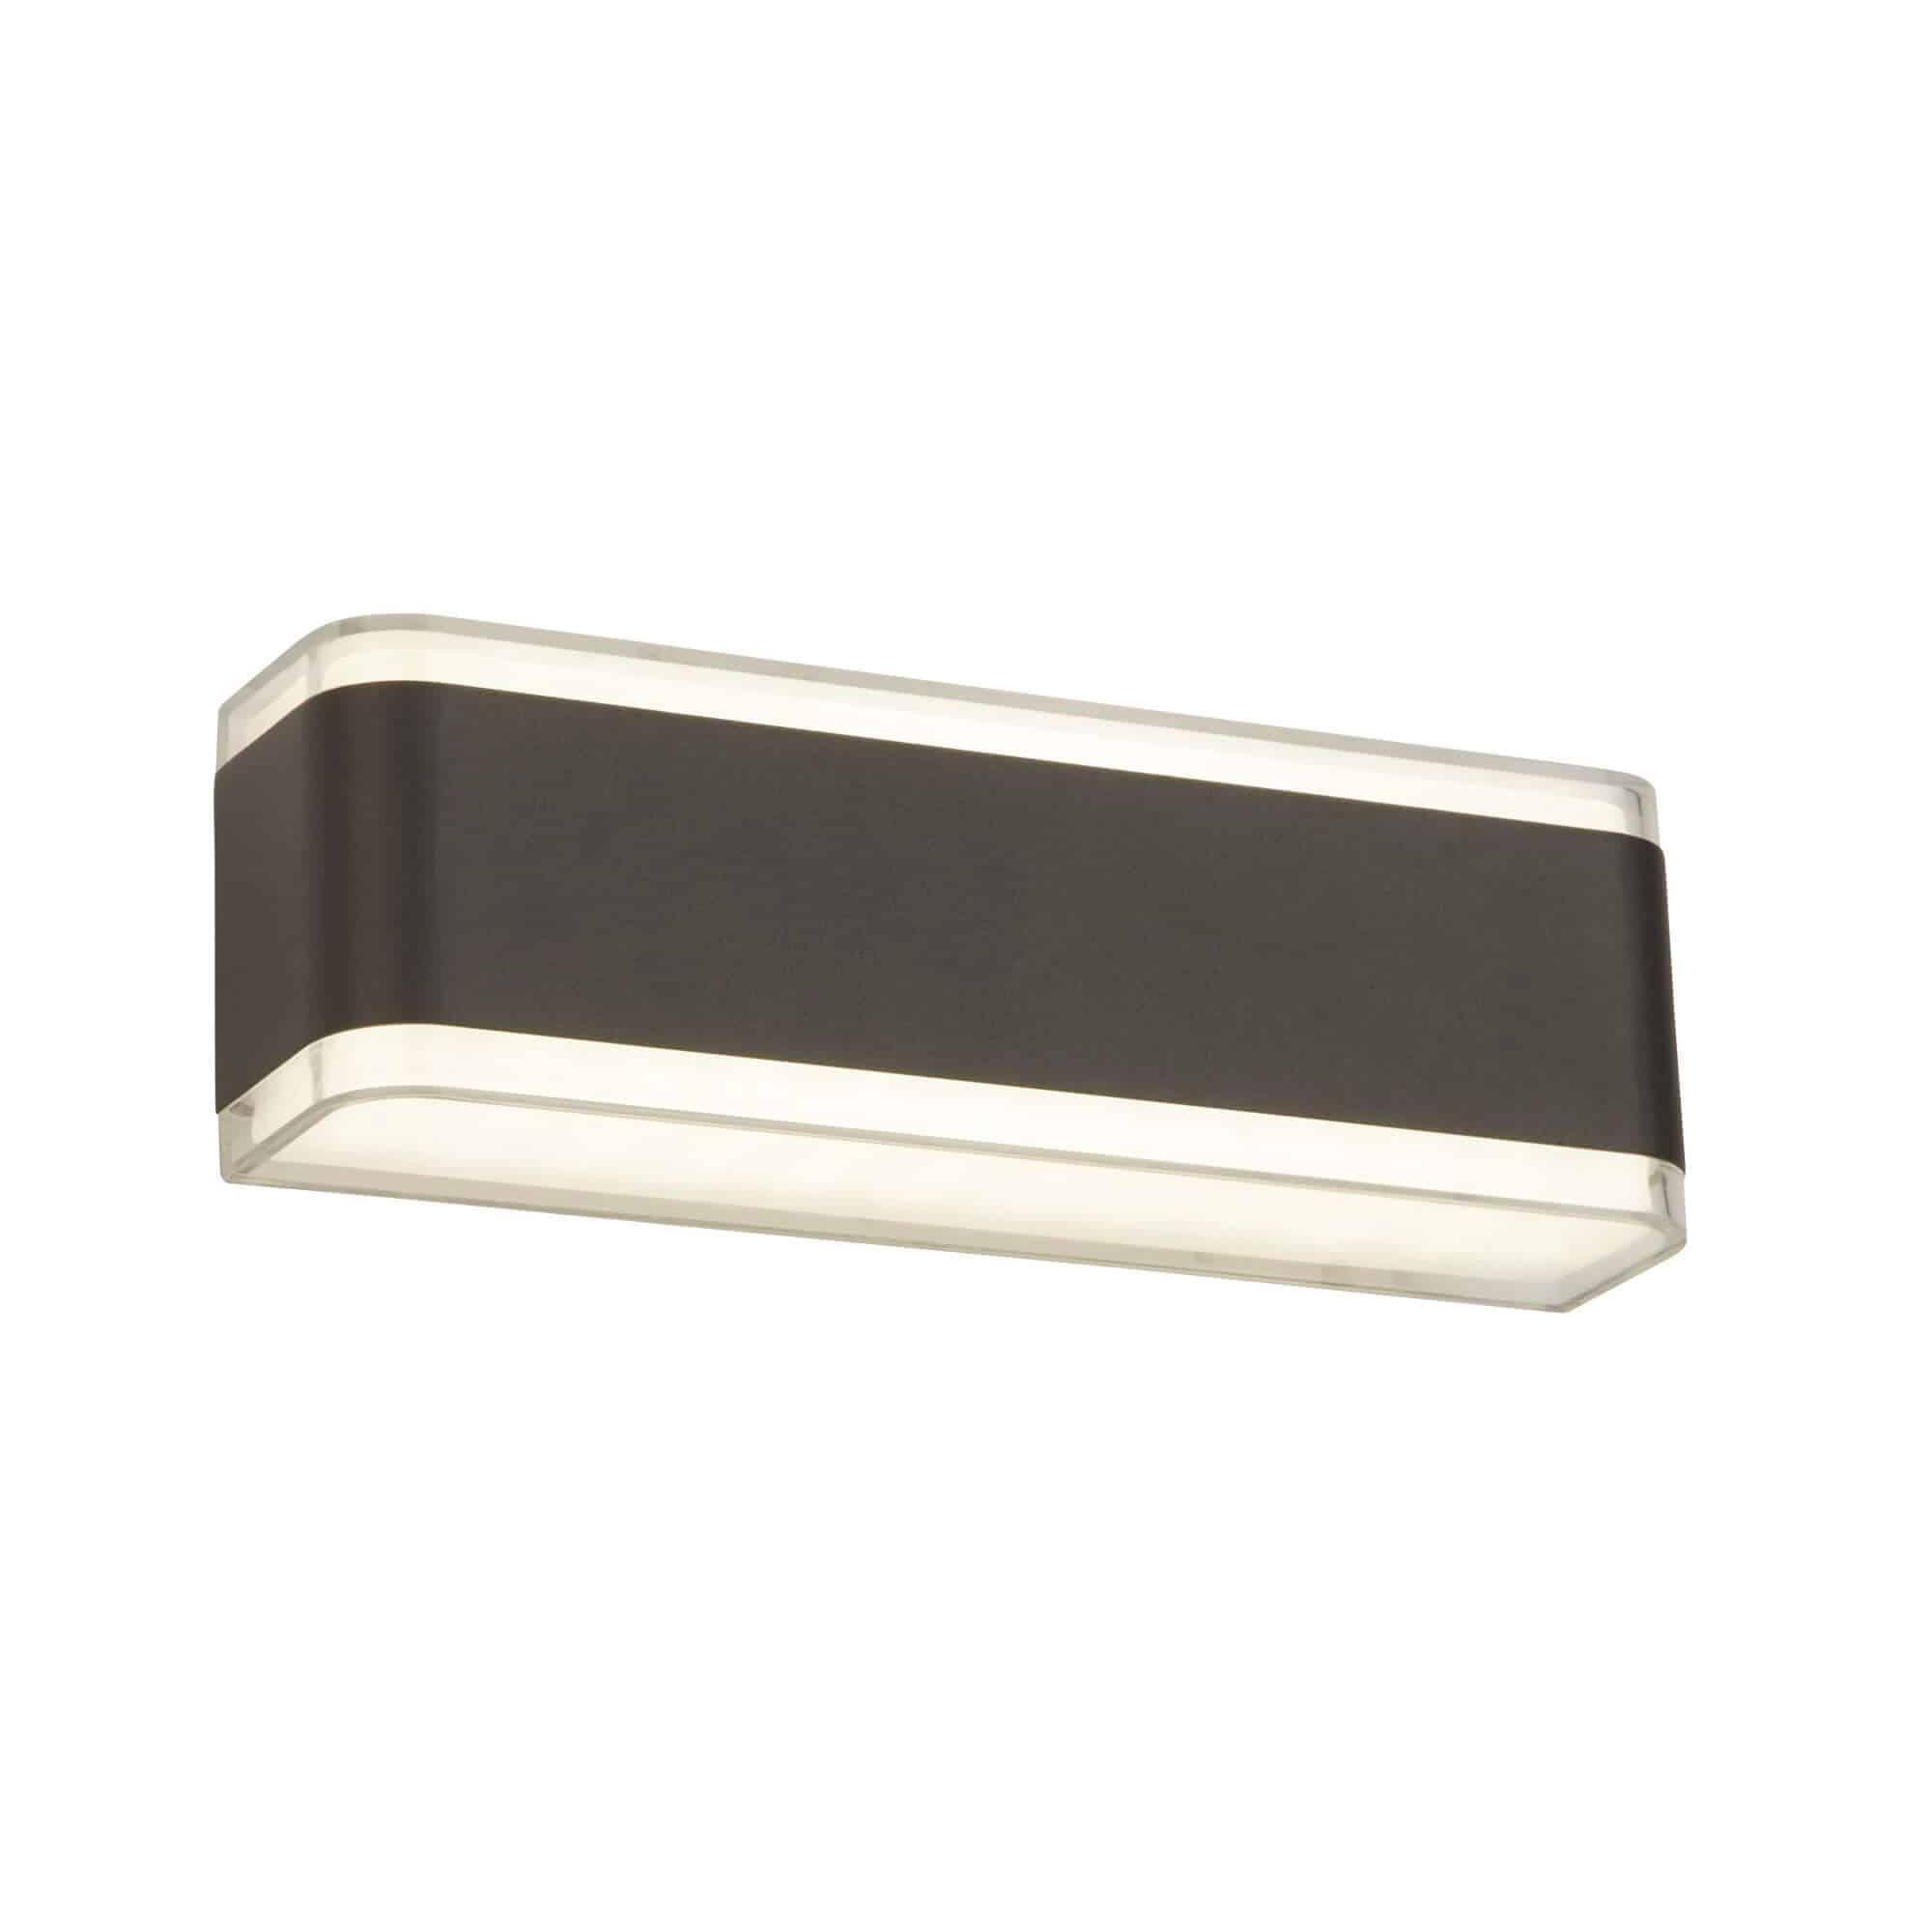 3671GY – Searchlight LED Dark Grey Outdoor Wall Light